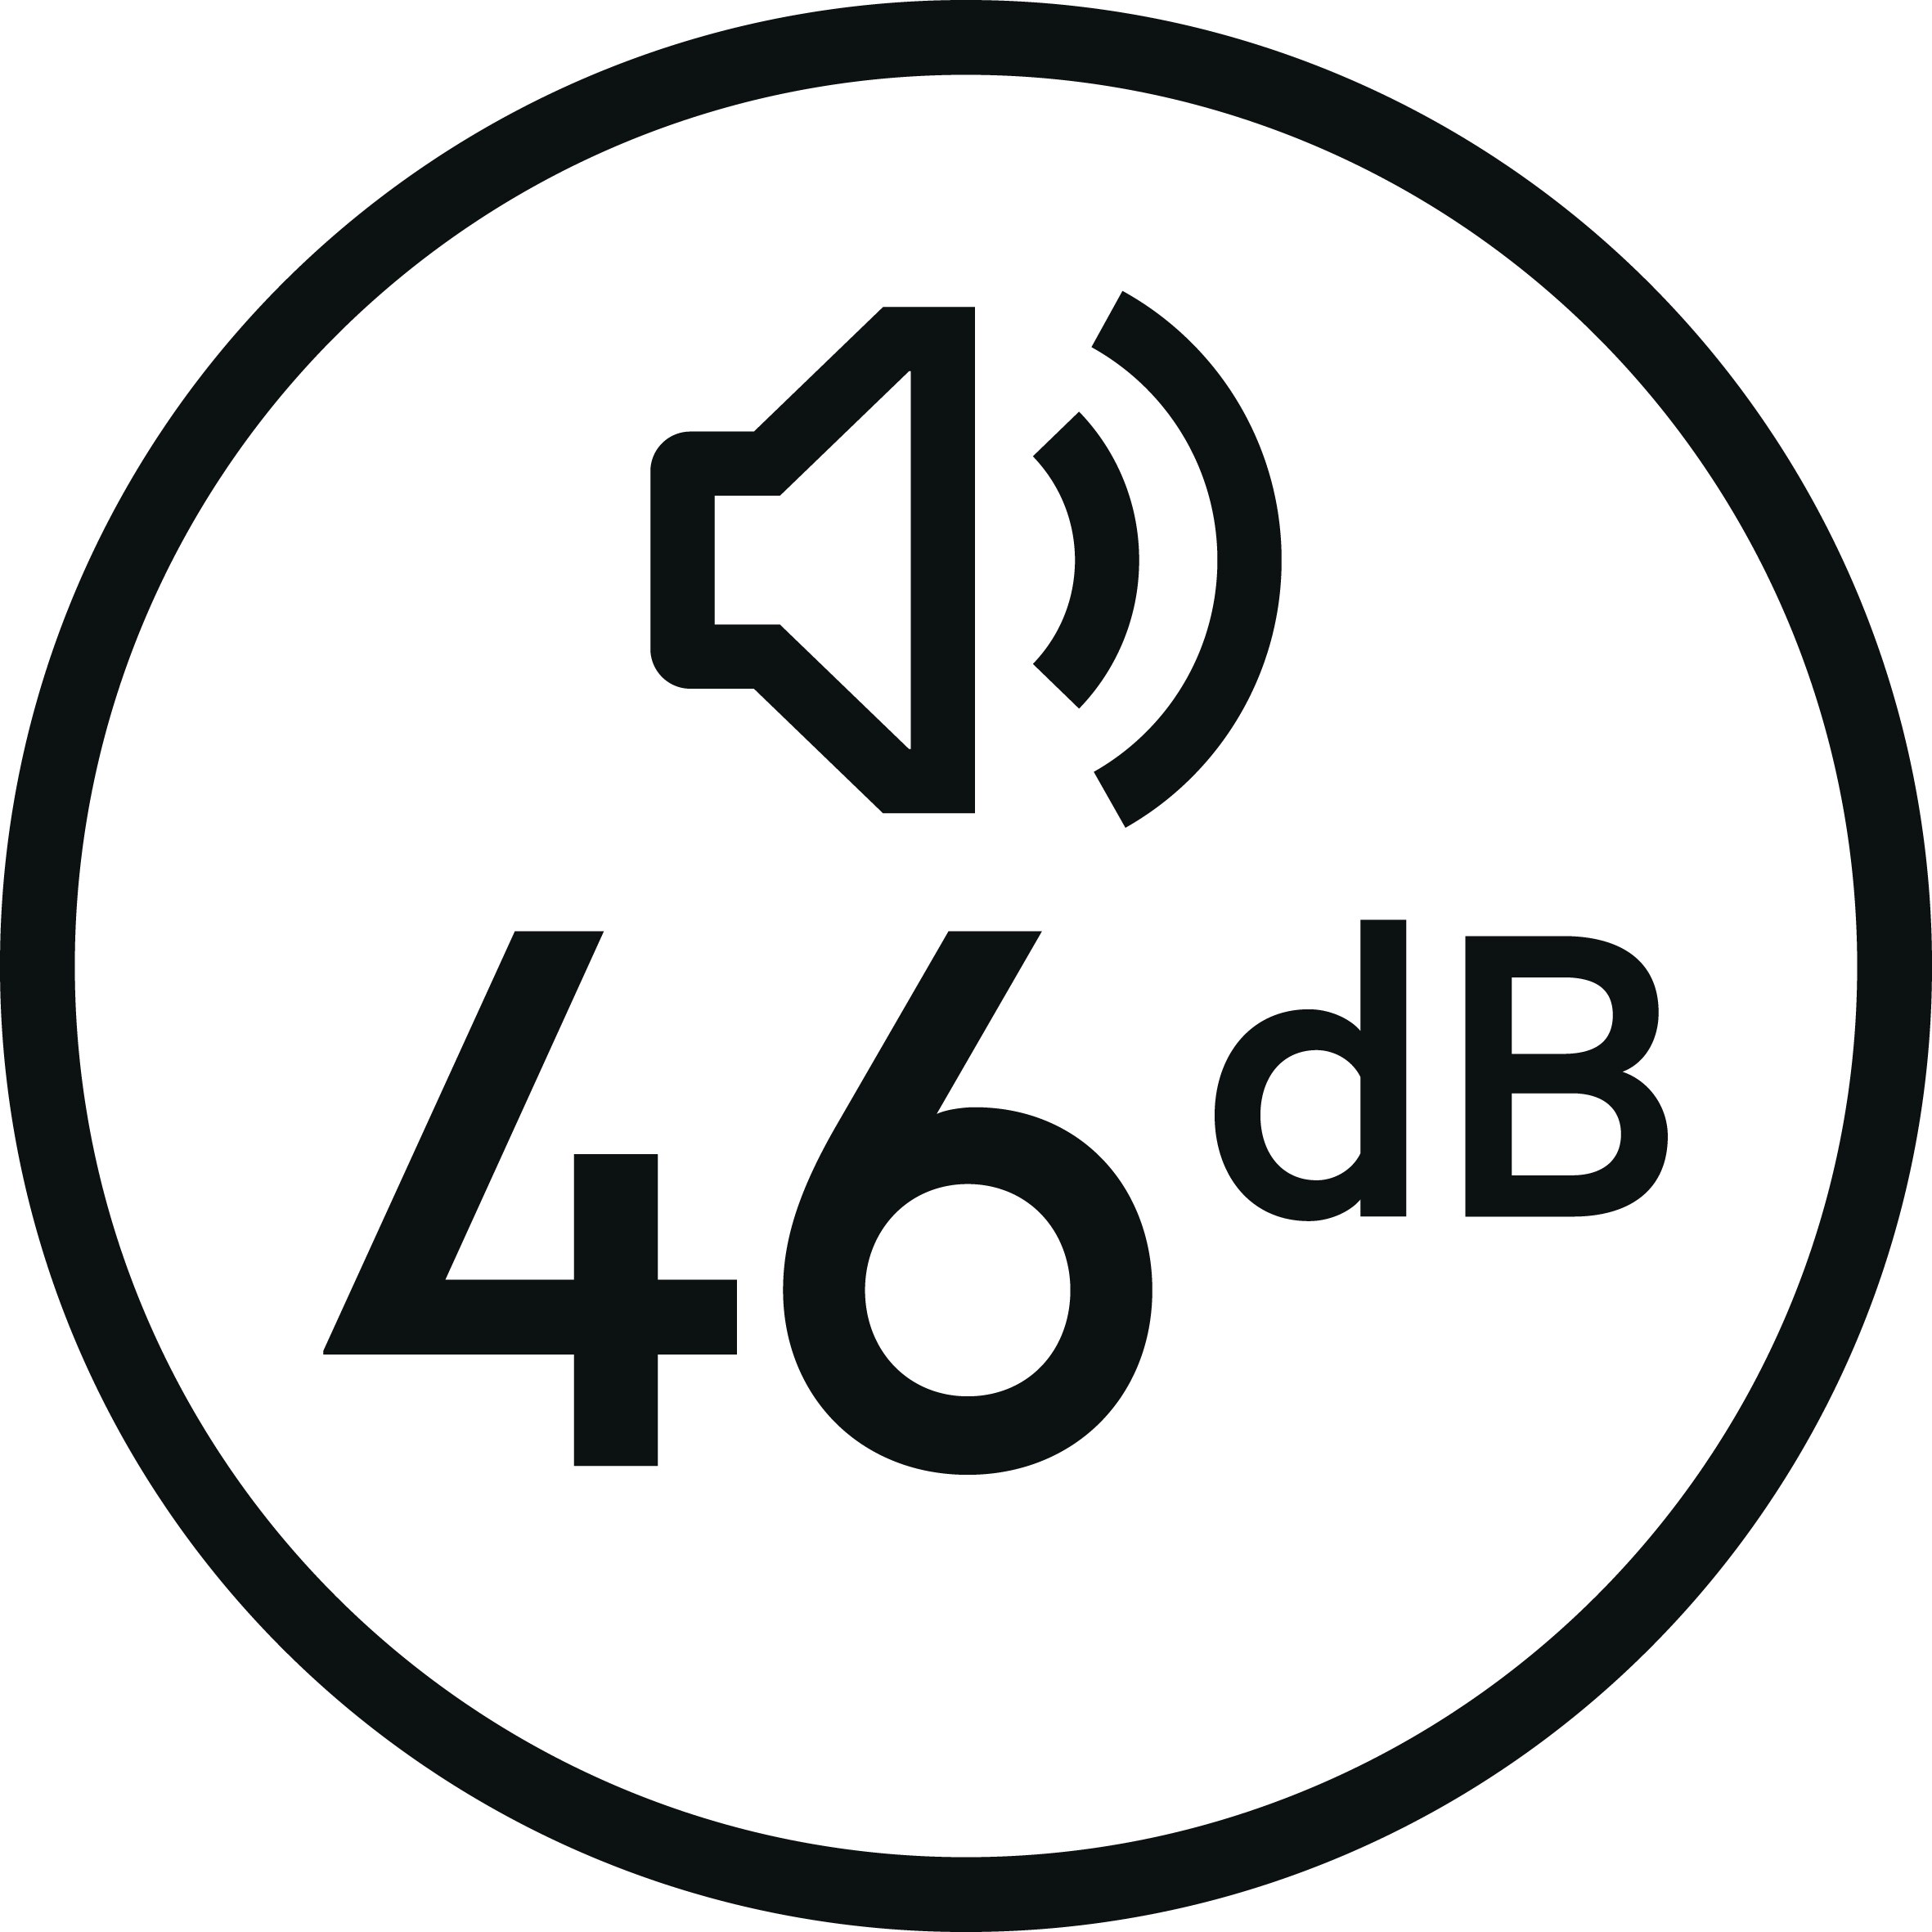 46dB-PSAAAP16PC569045.jpg